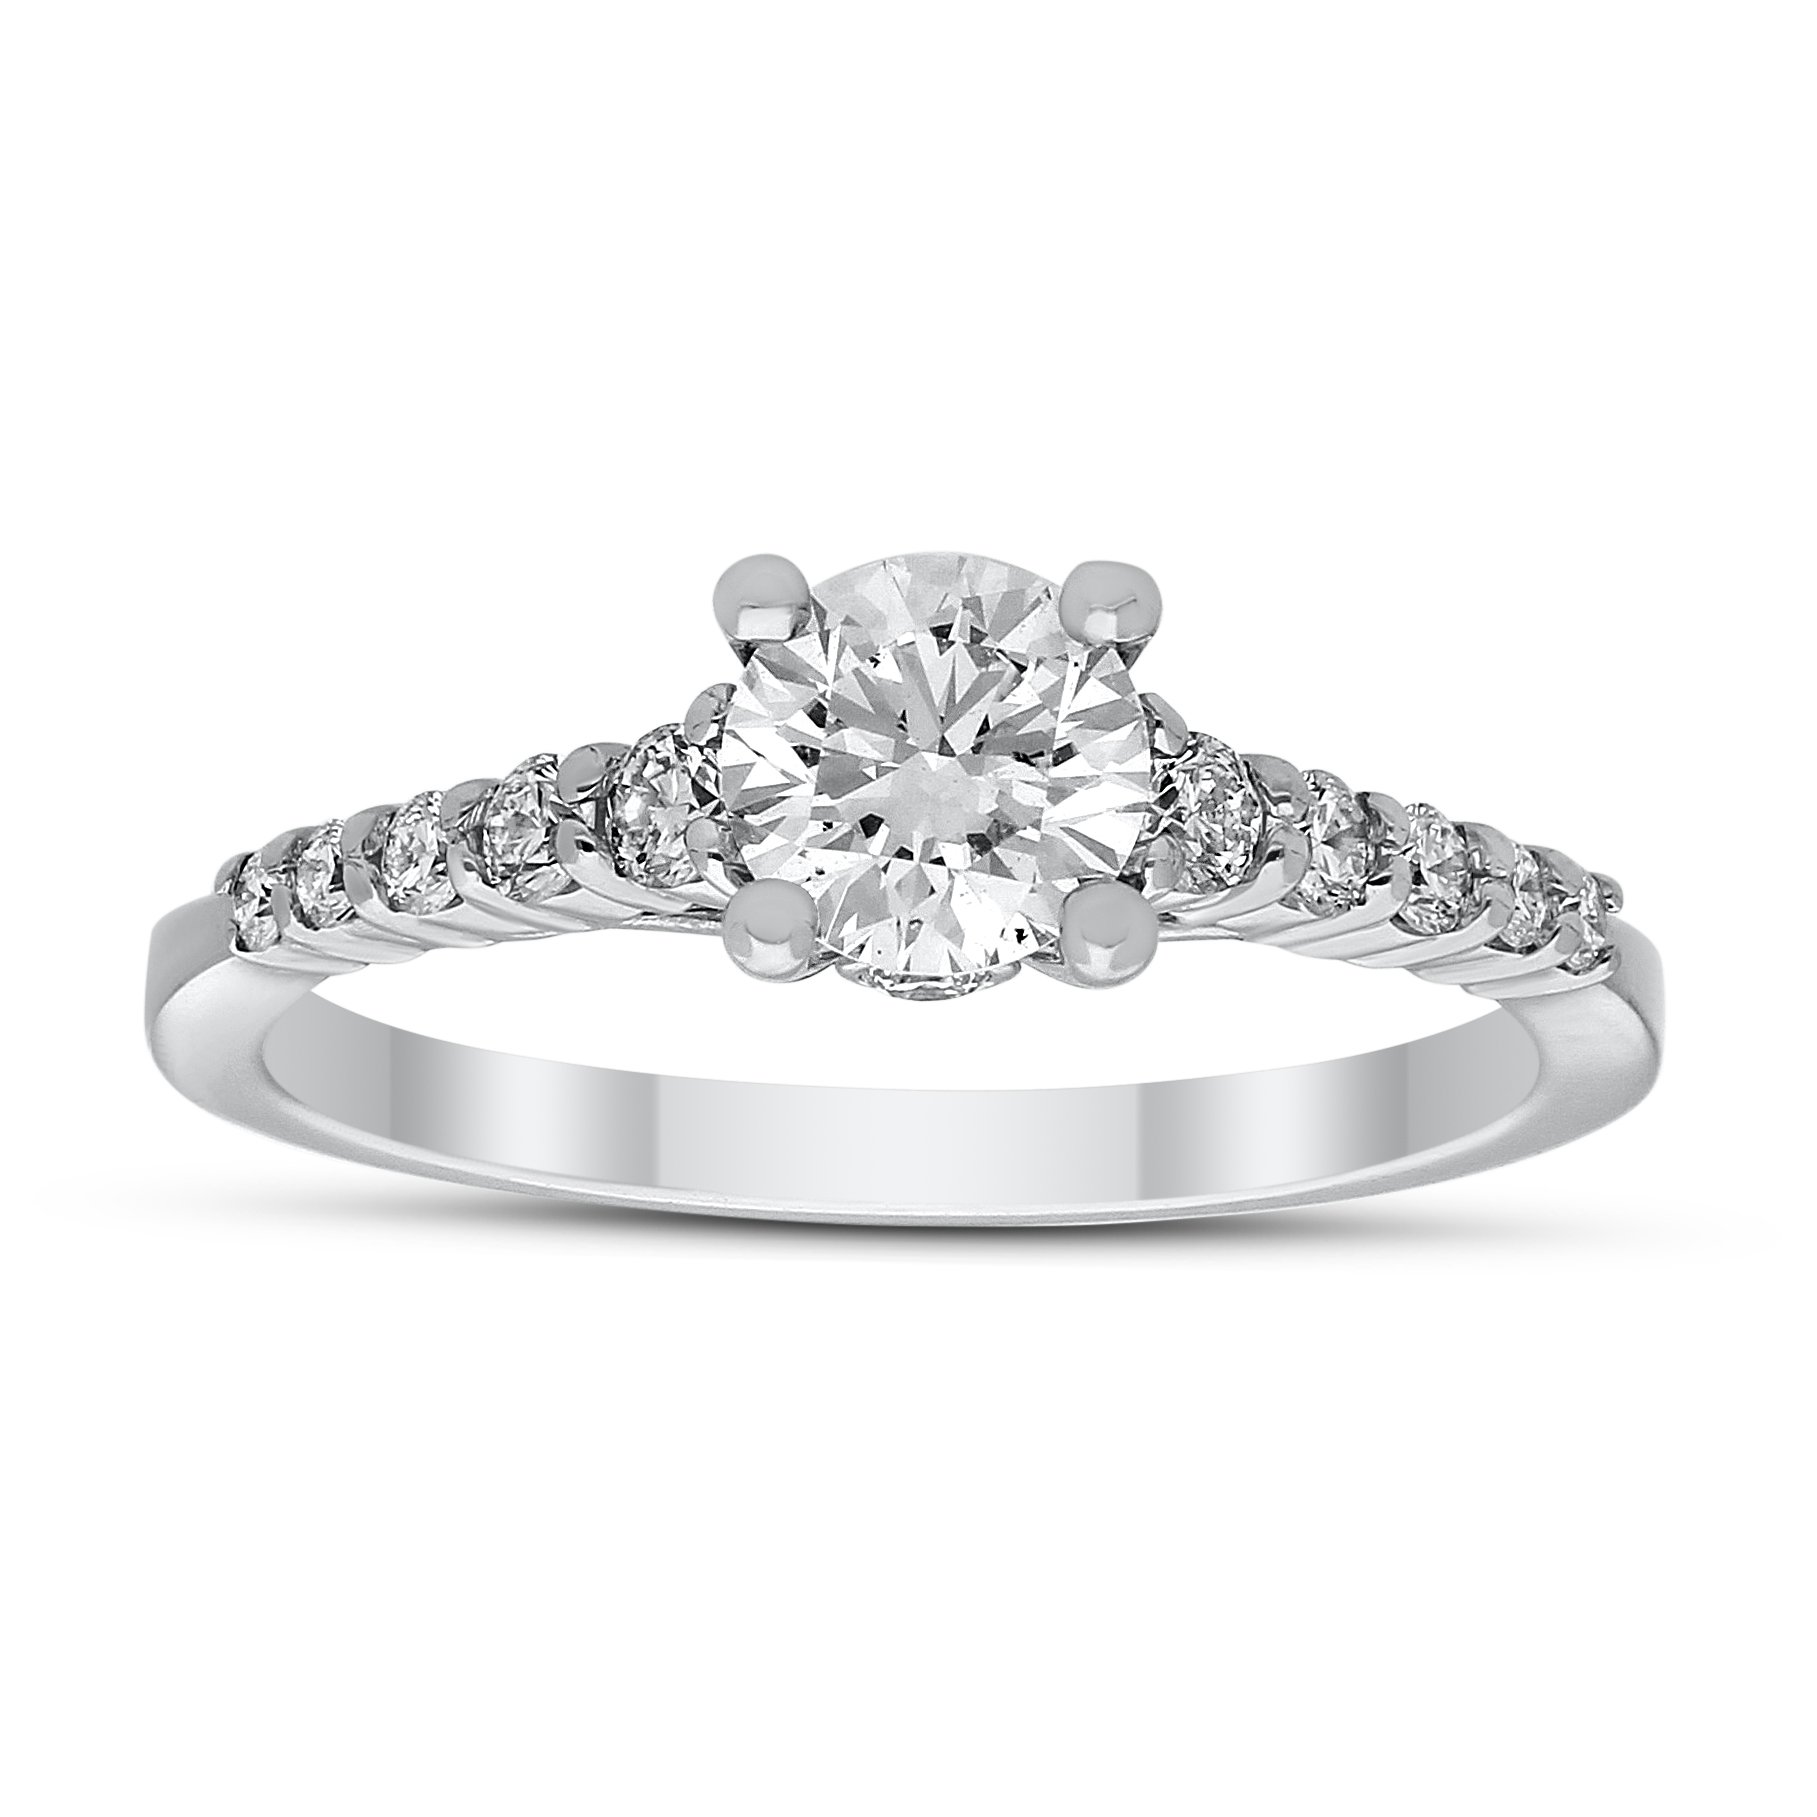 Gaia Diamond Ring in White Gold - madeinUSAdiamonds